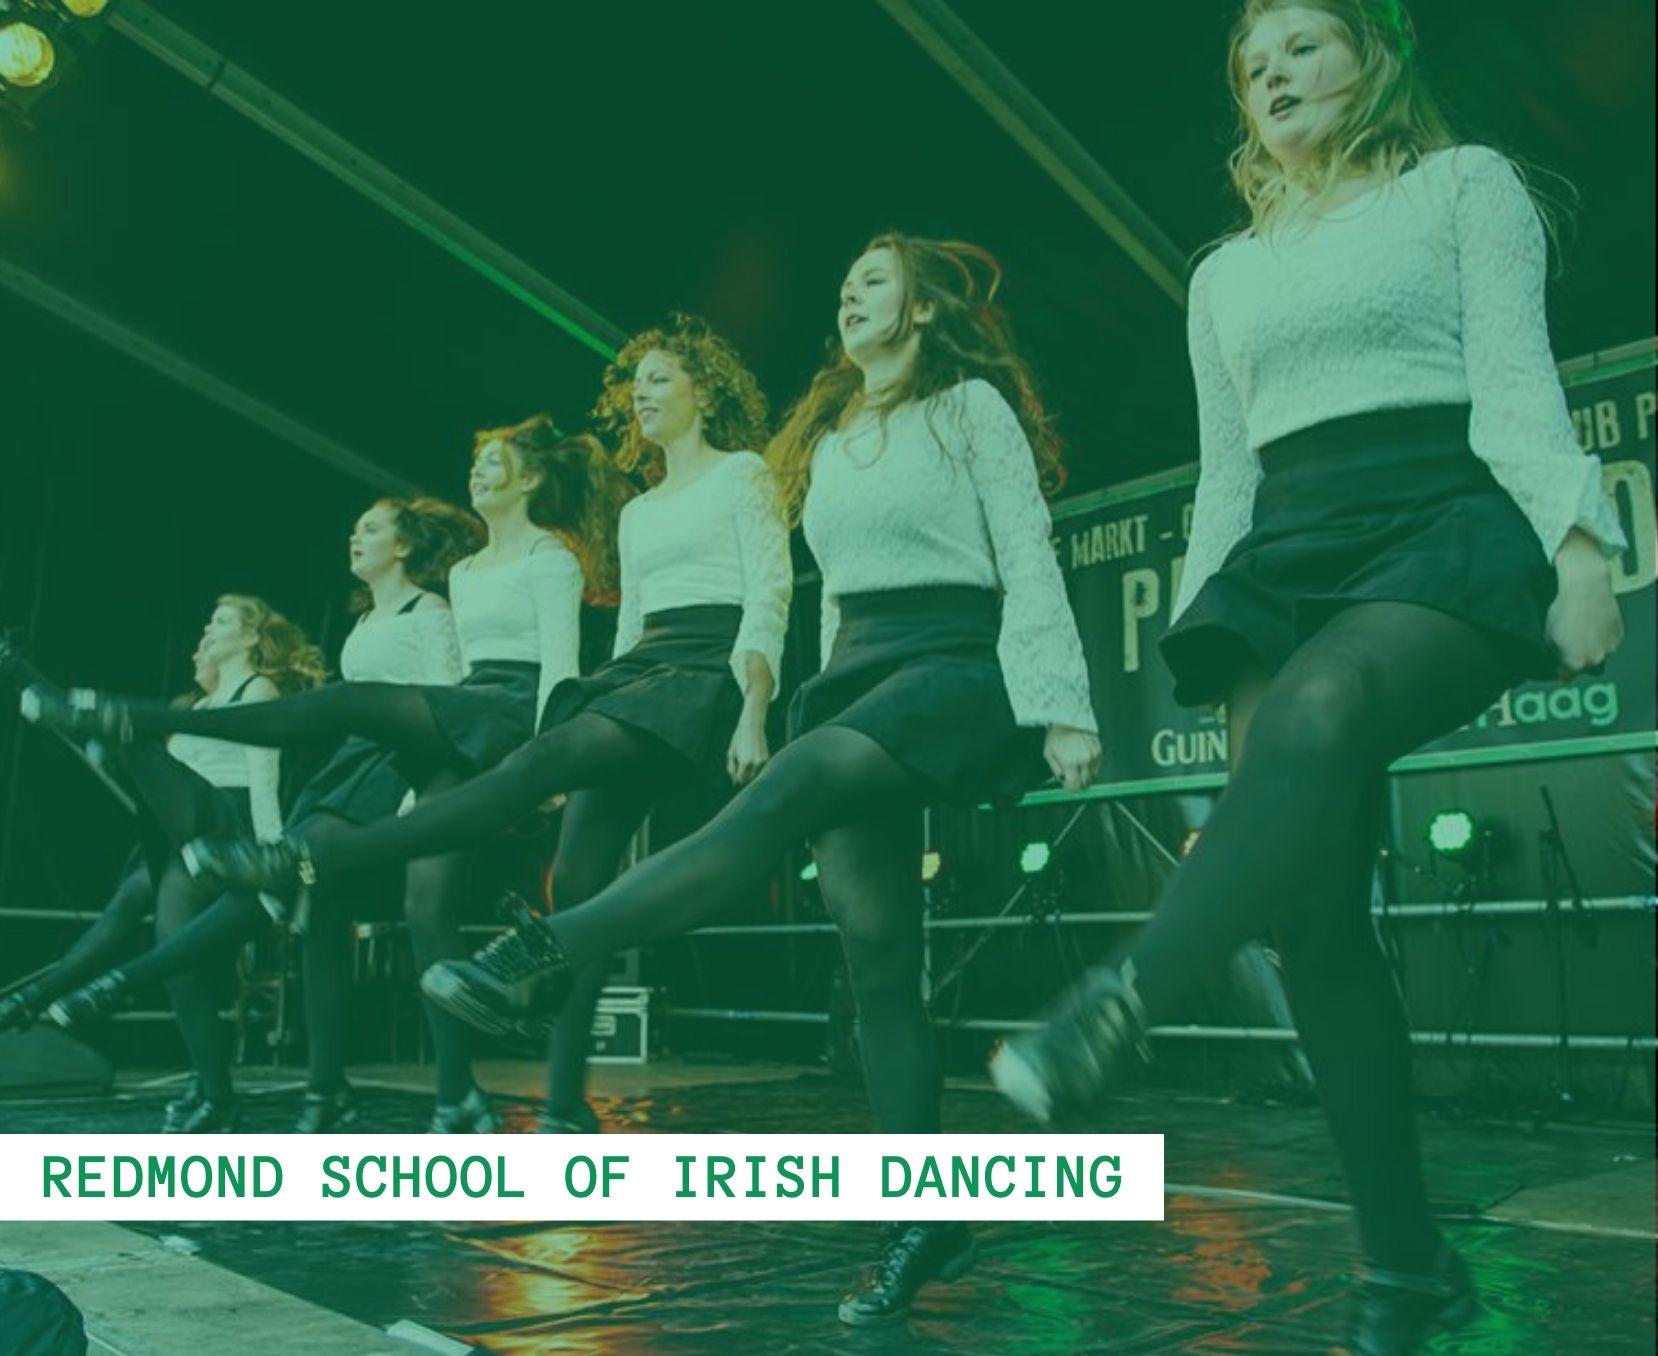 redmond school of irsh dancing - st patricks day 2020 the hague